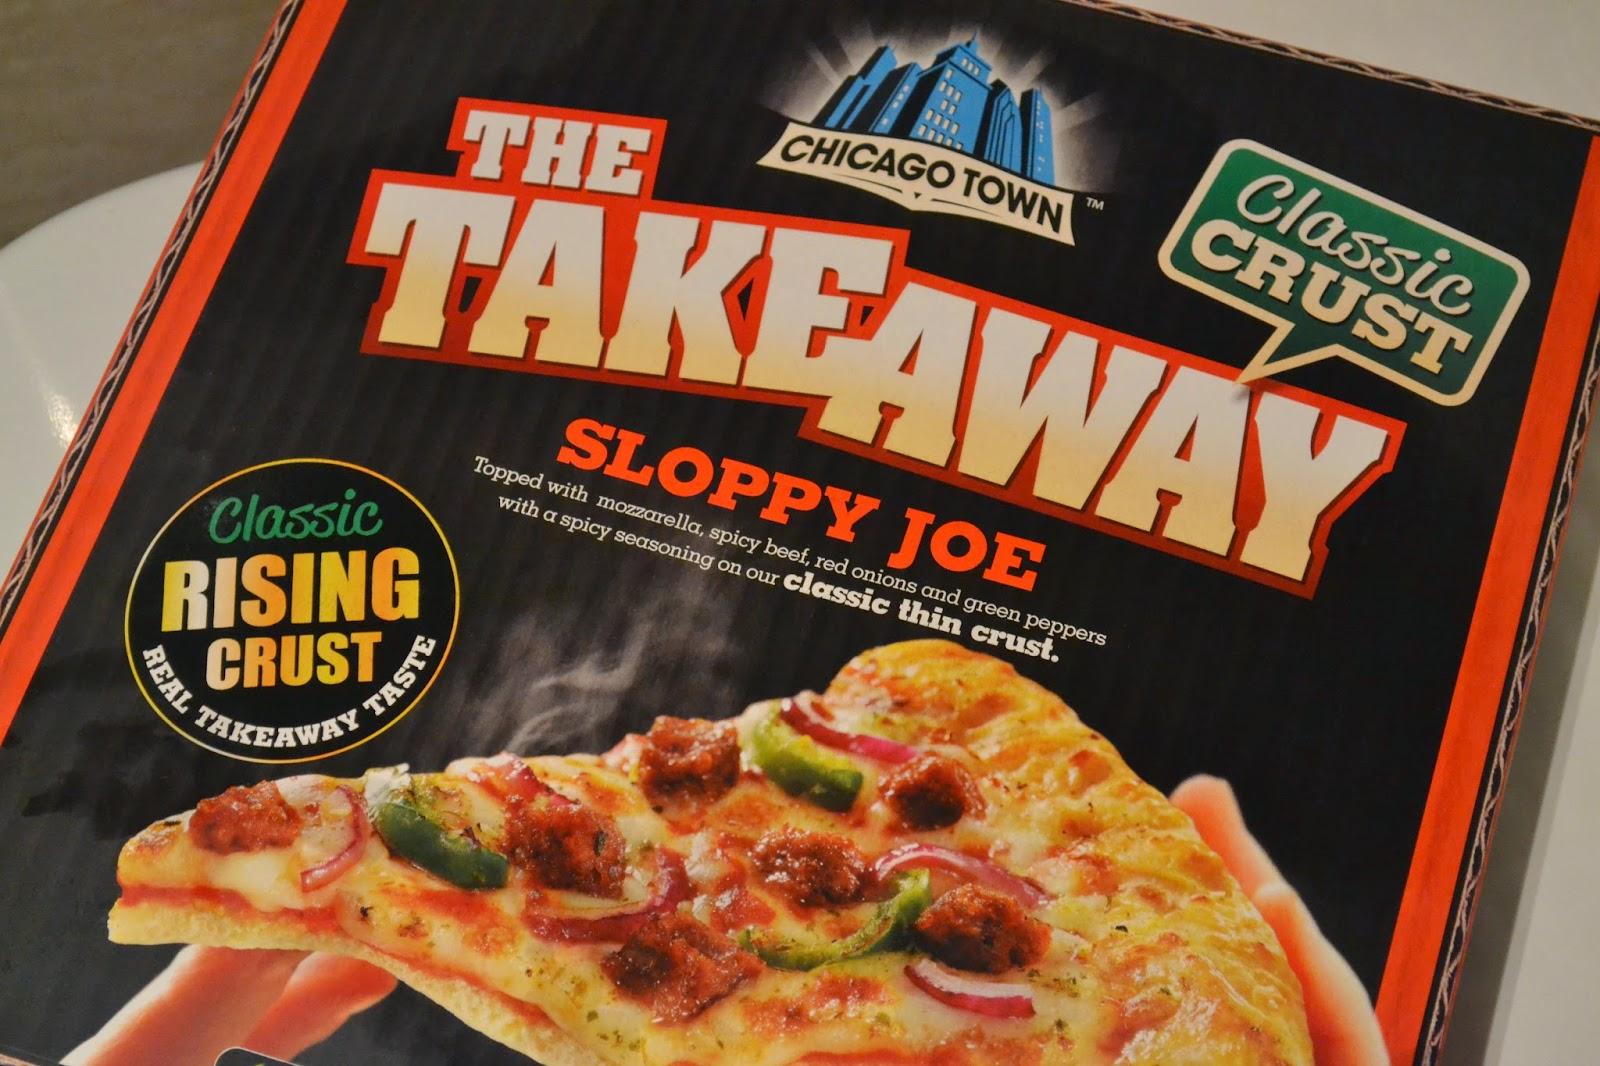 chicago-town-takeaway-sloppy-joe